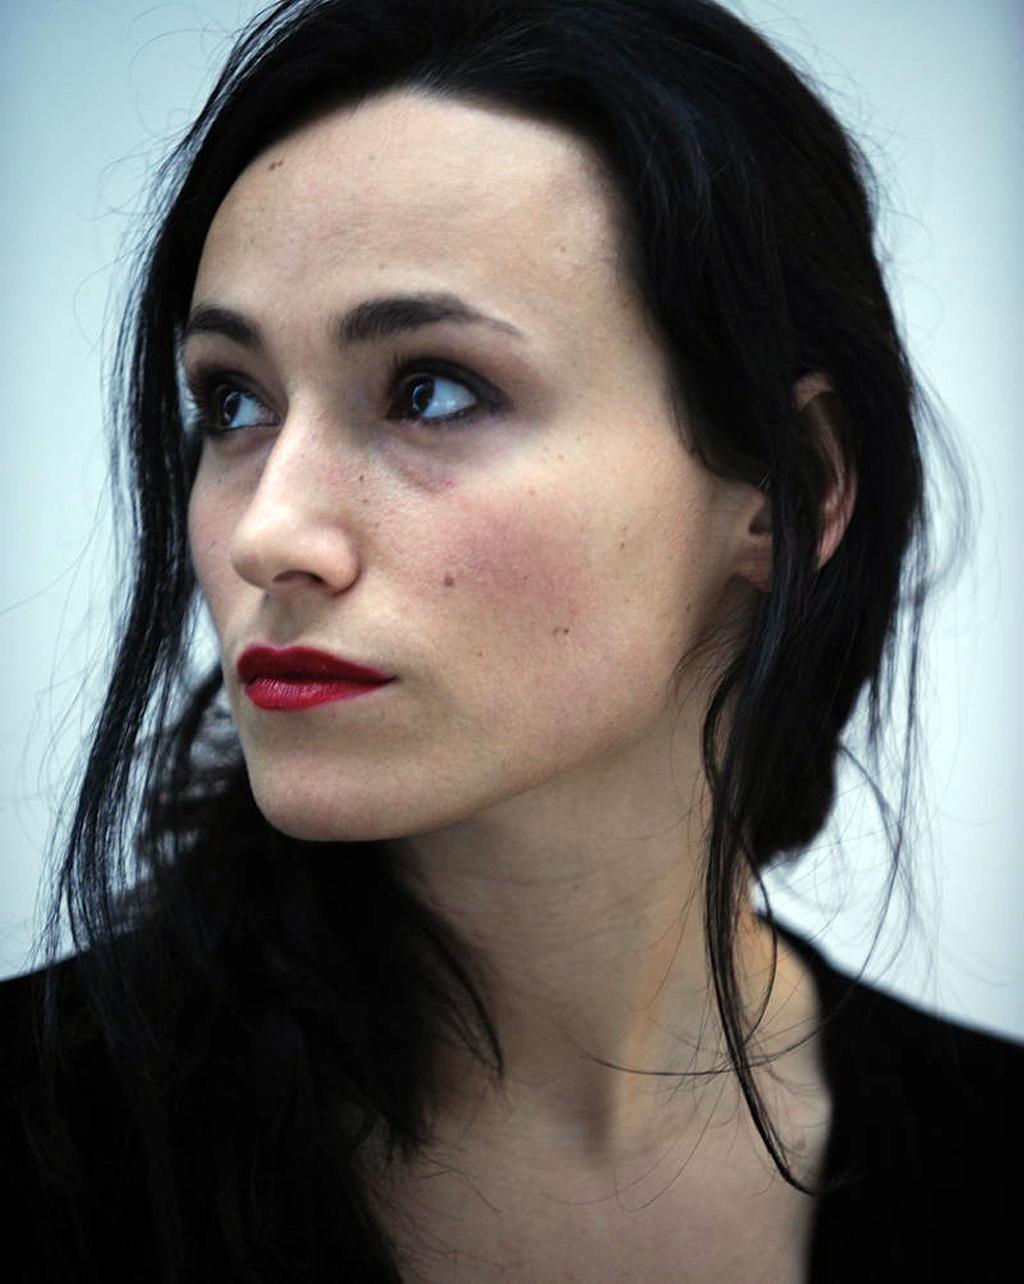 arijana-robert-schultze-2011-06